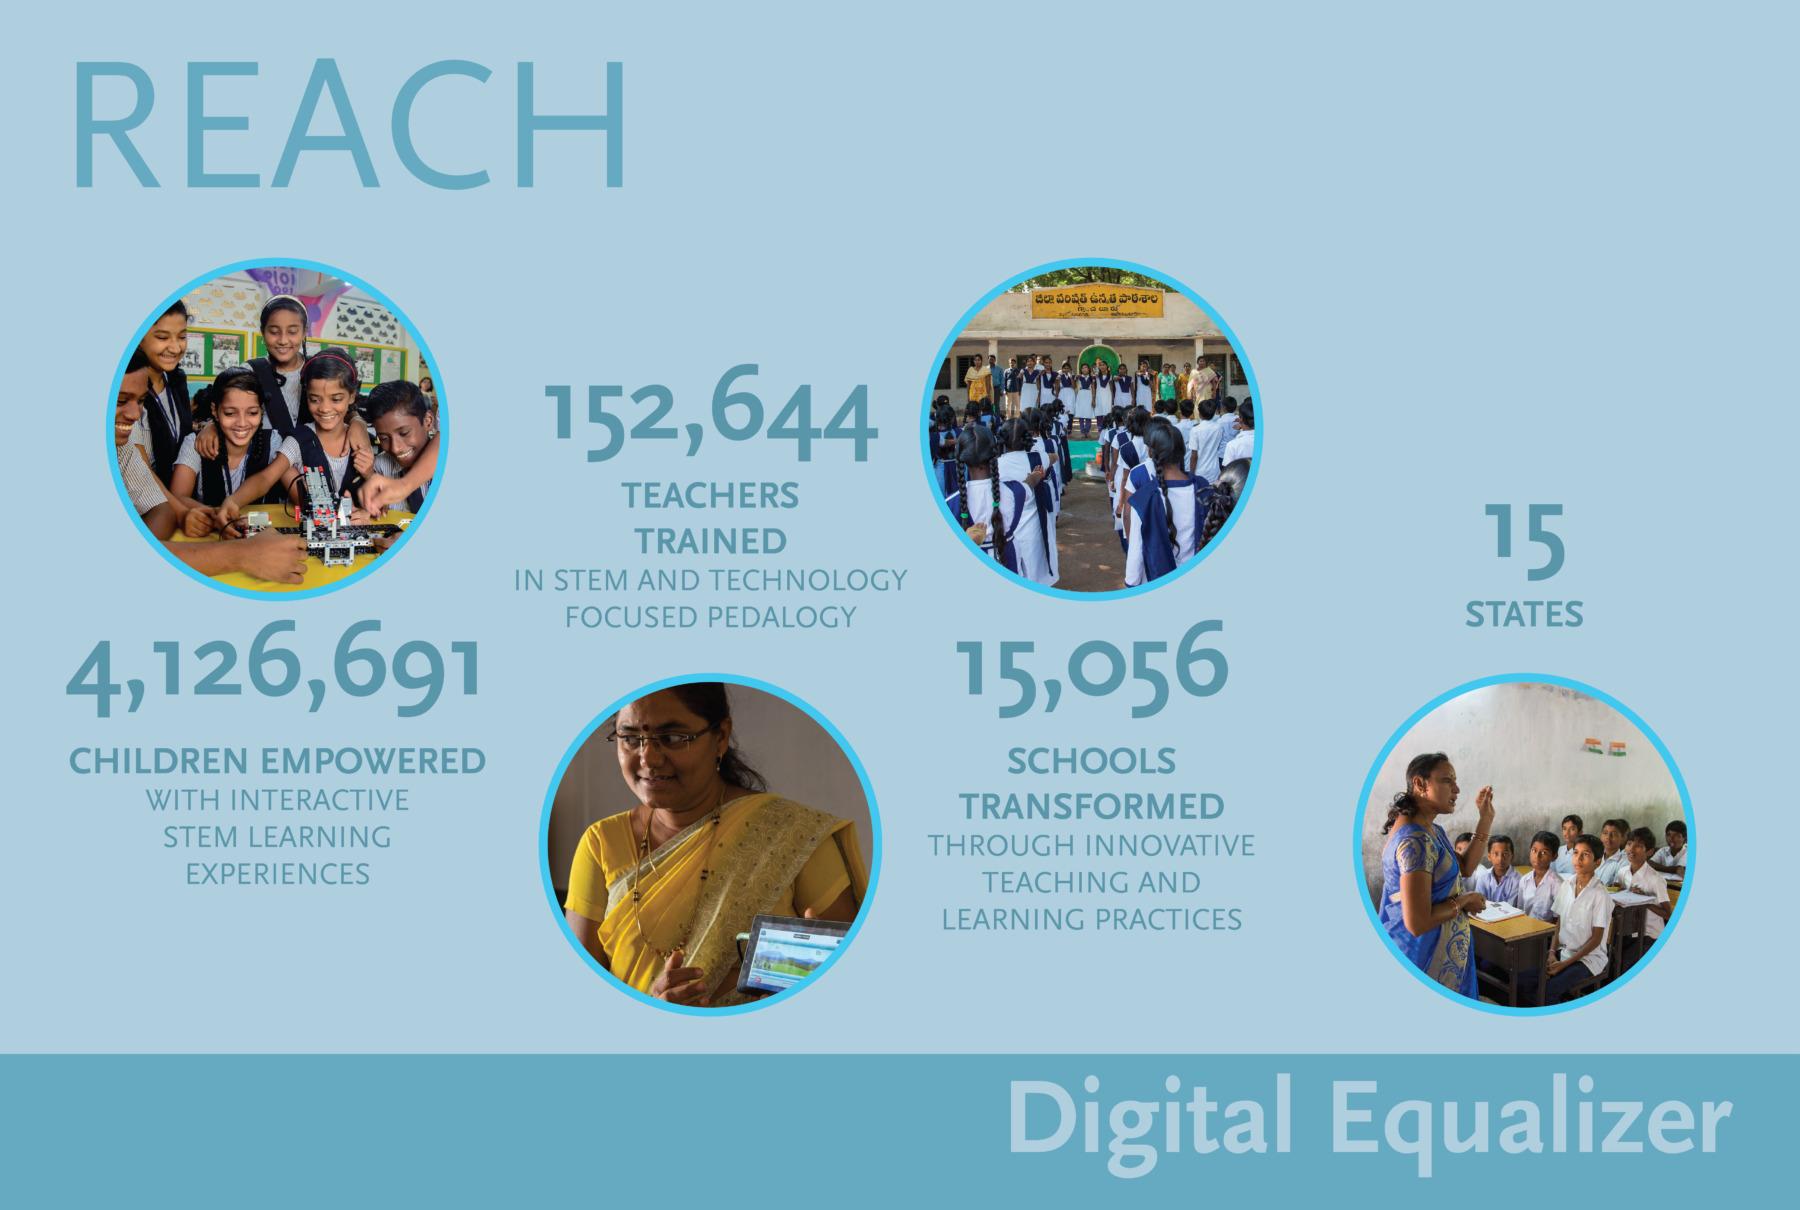 DE Reach: 4,126,691 Students. 152,644 Teachers. 15,056 Schools. 15 States.